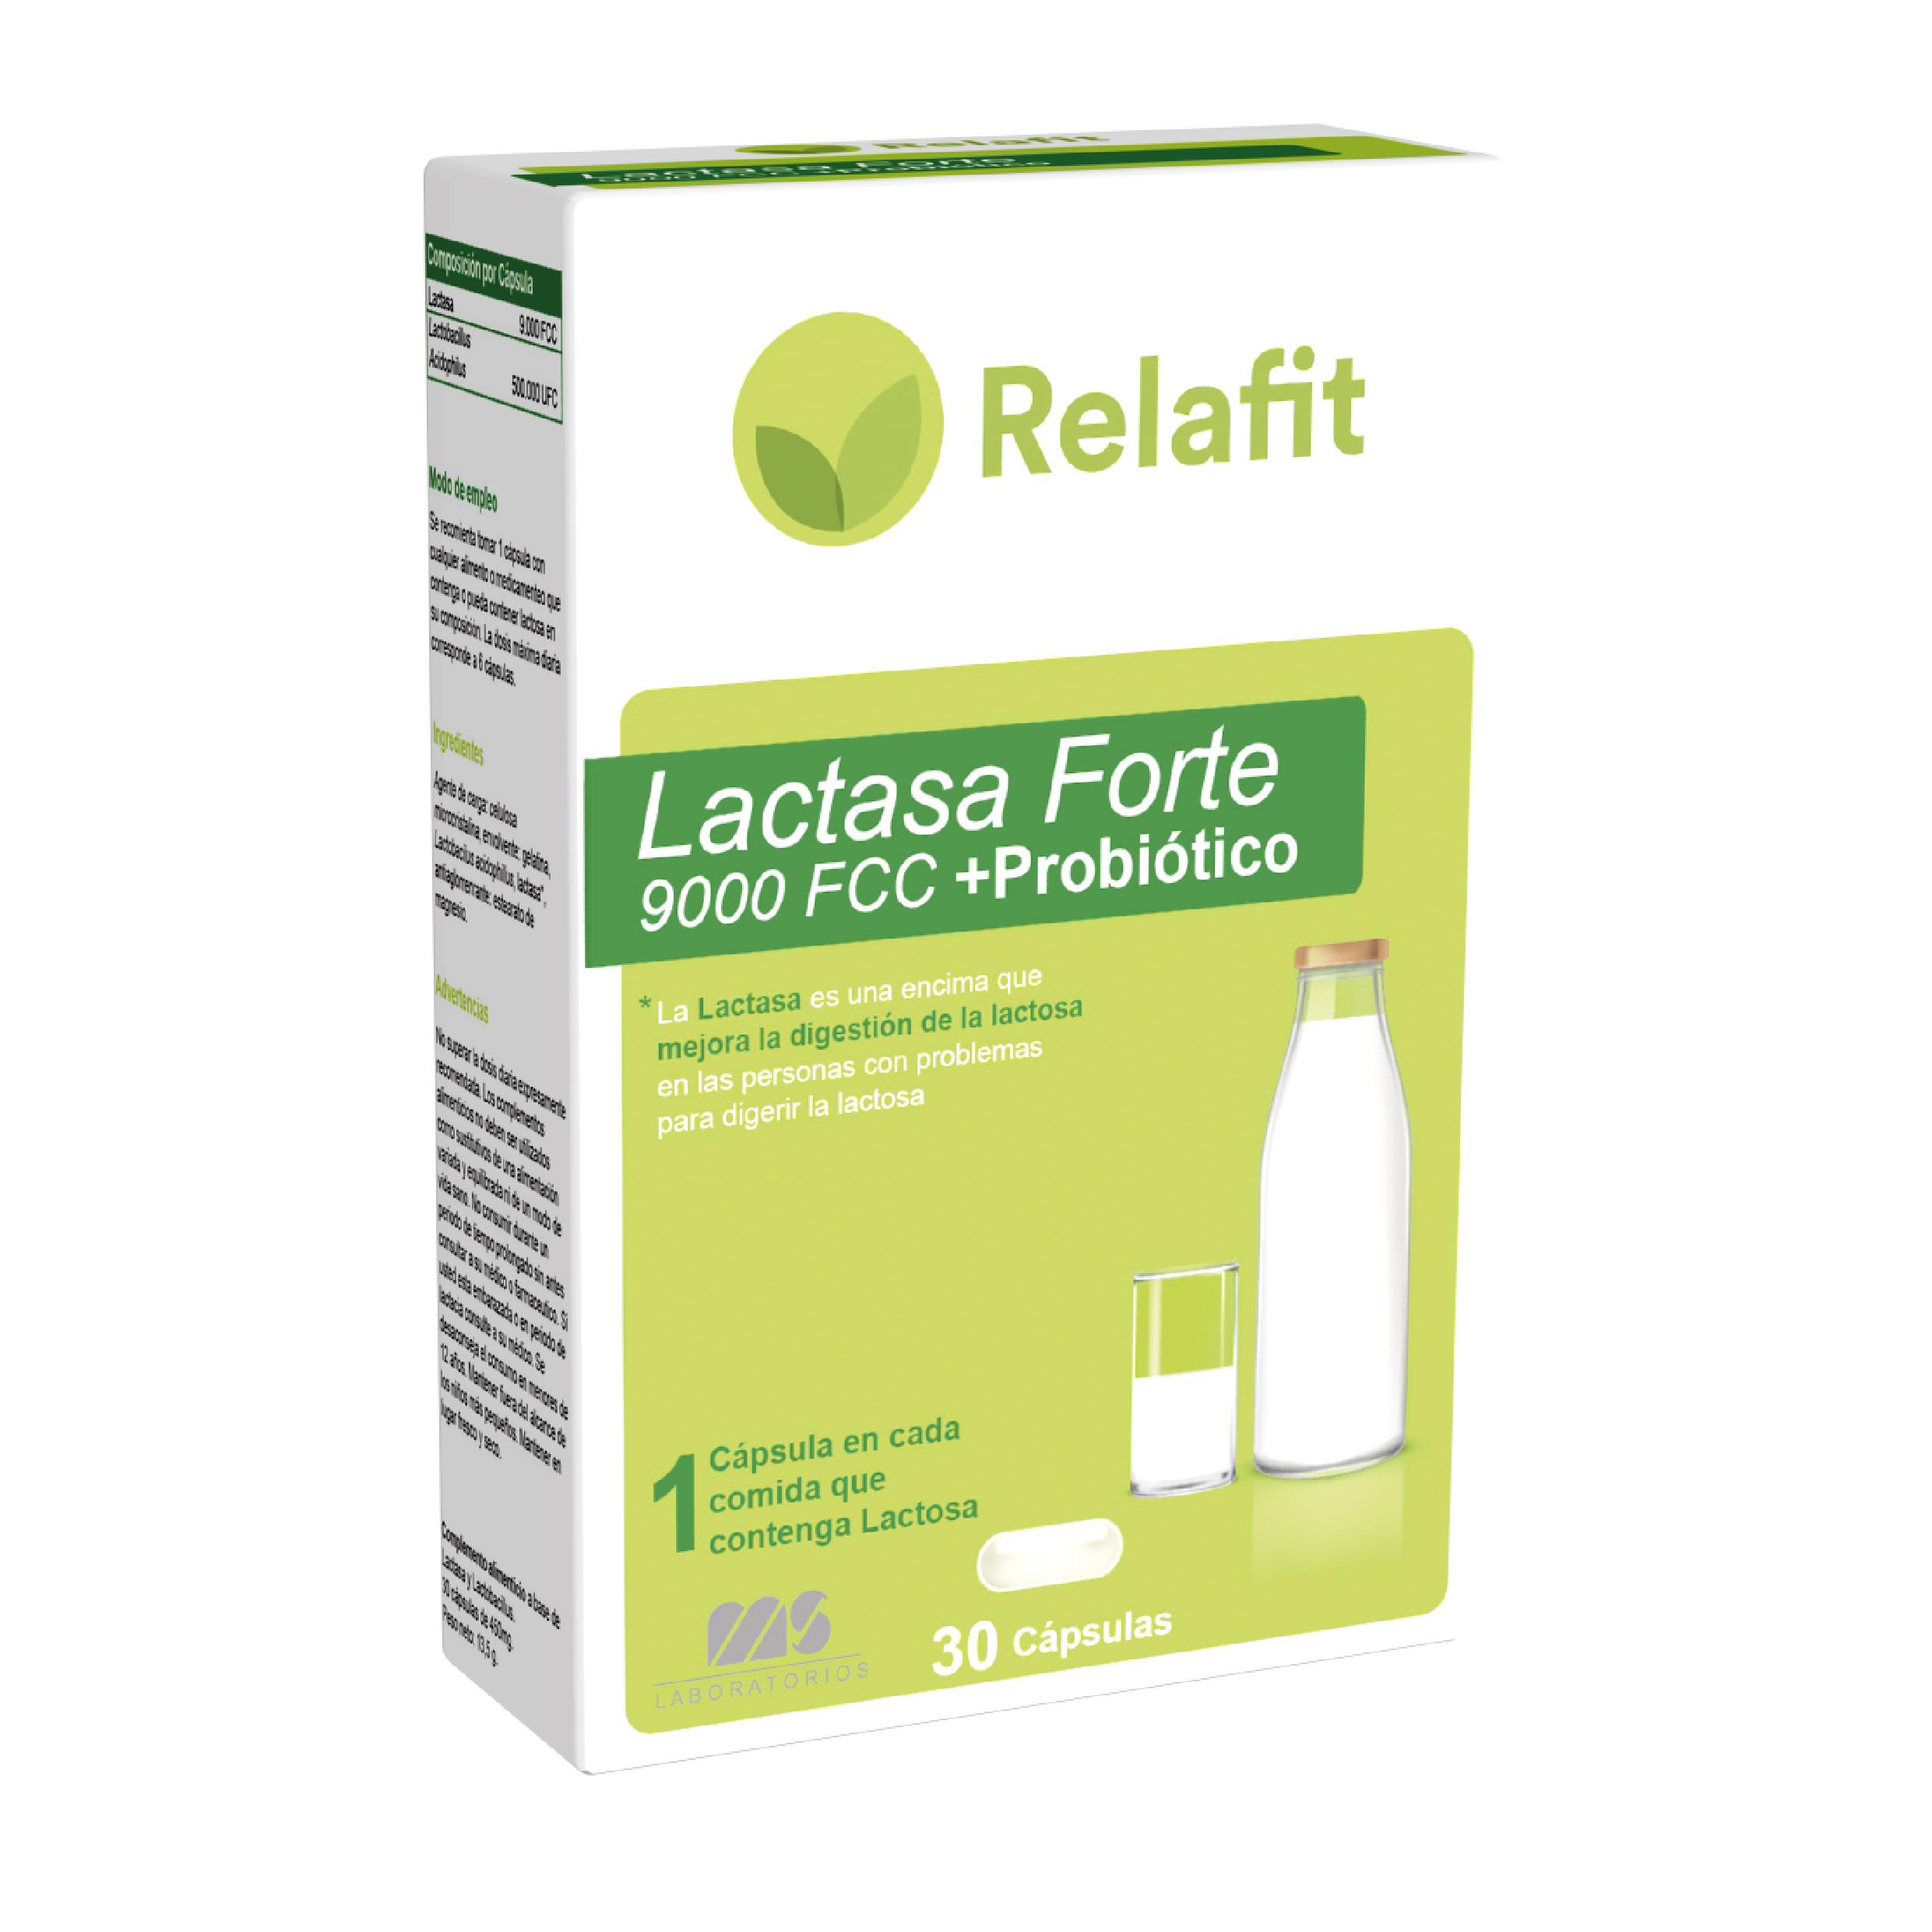 Lactasa Forte